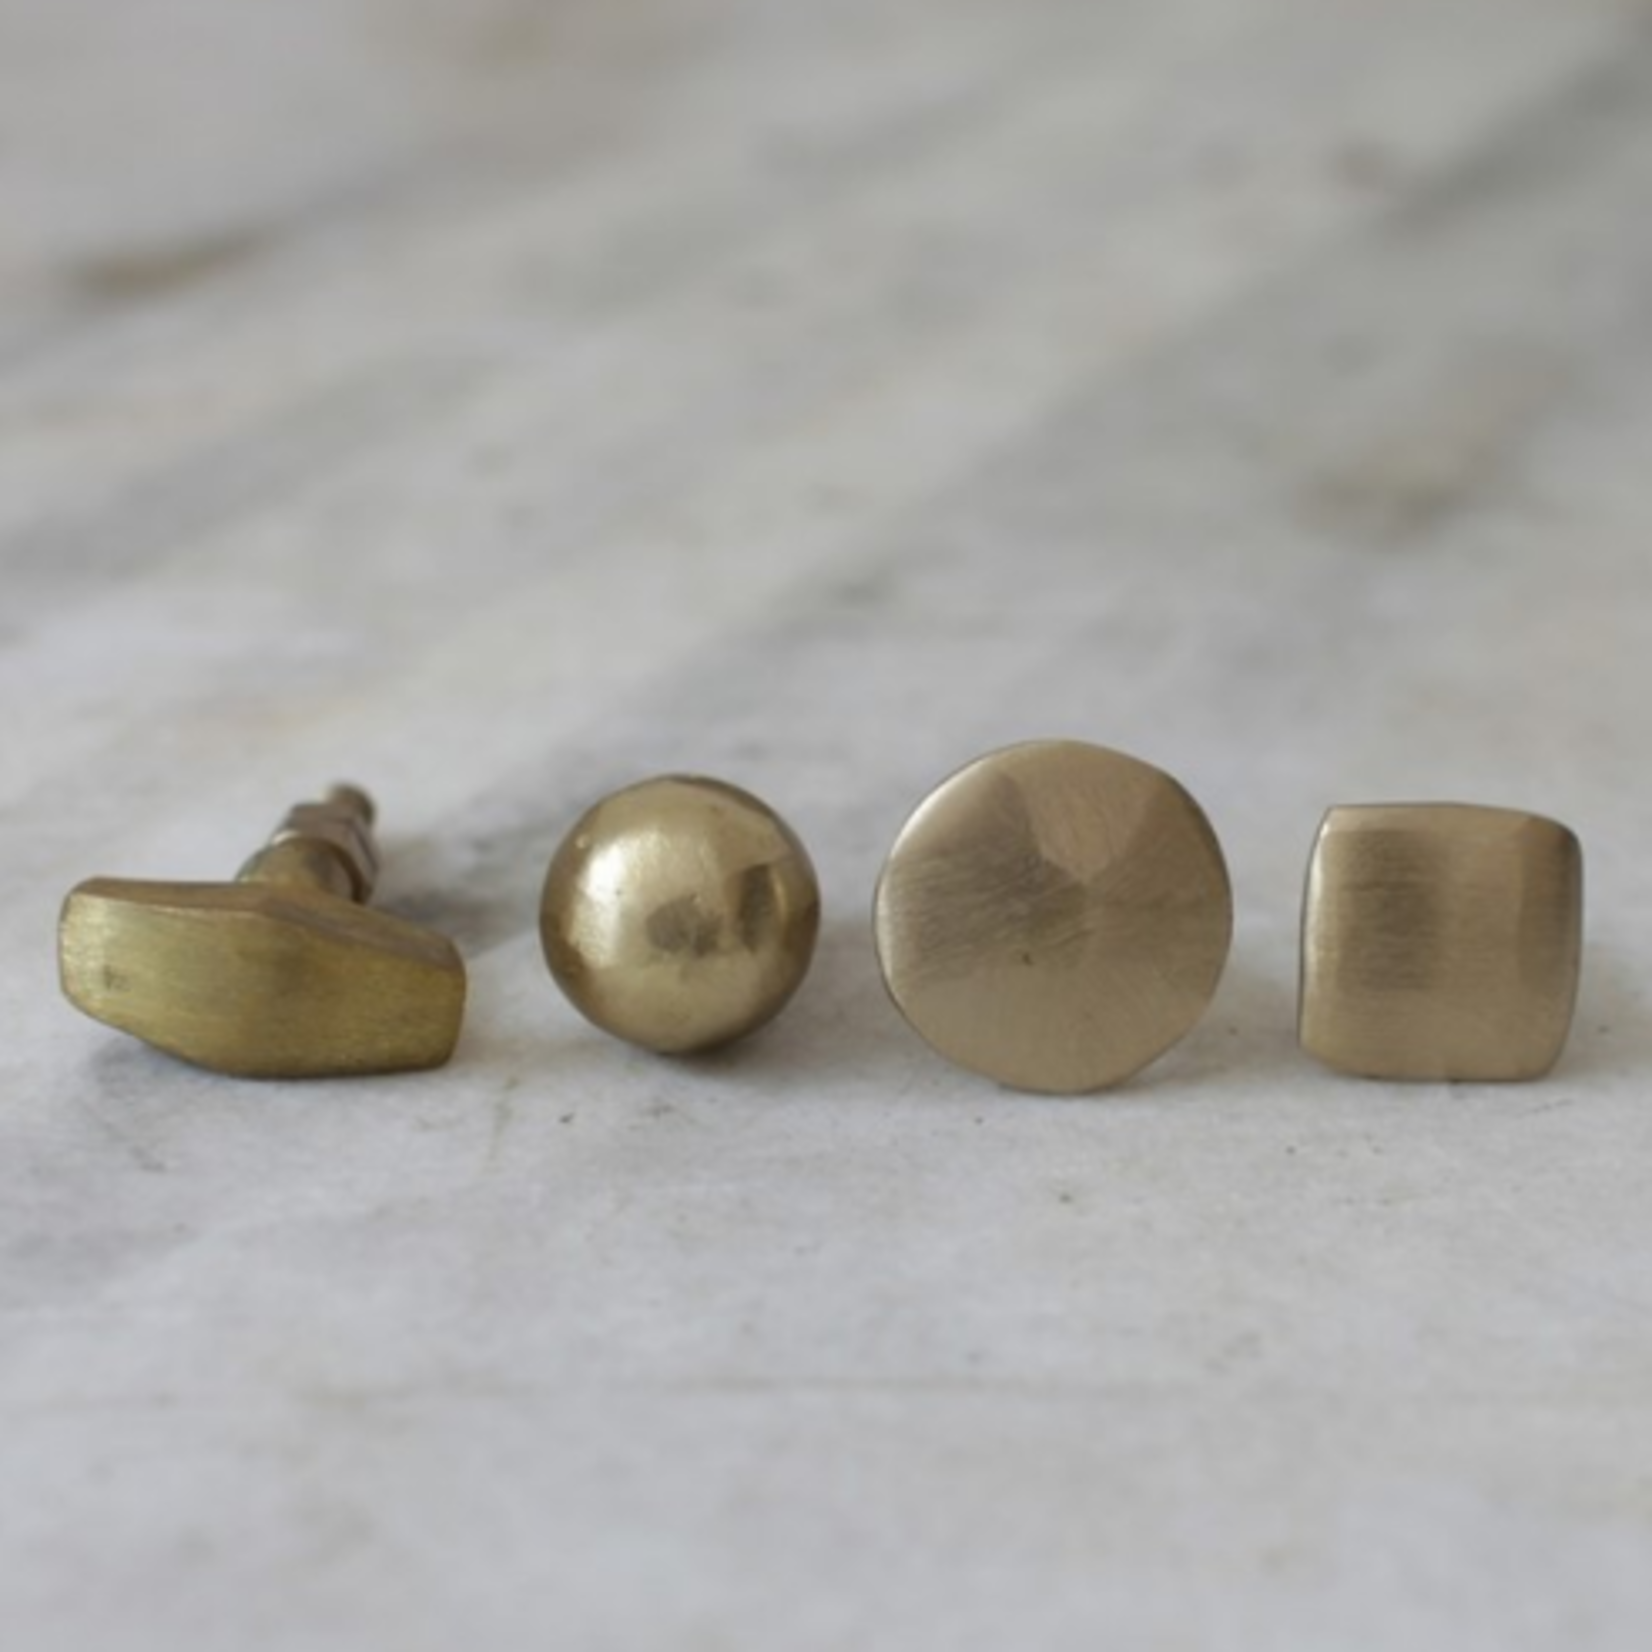 Nkuku Aso Brass Knob - Flat Round